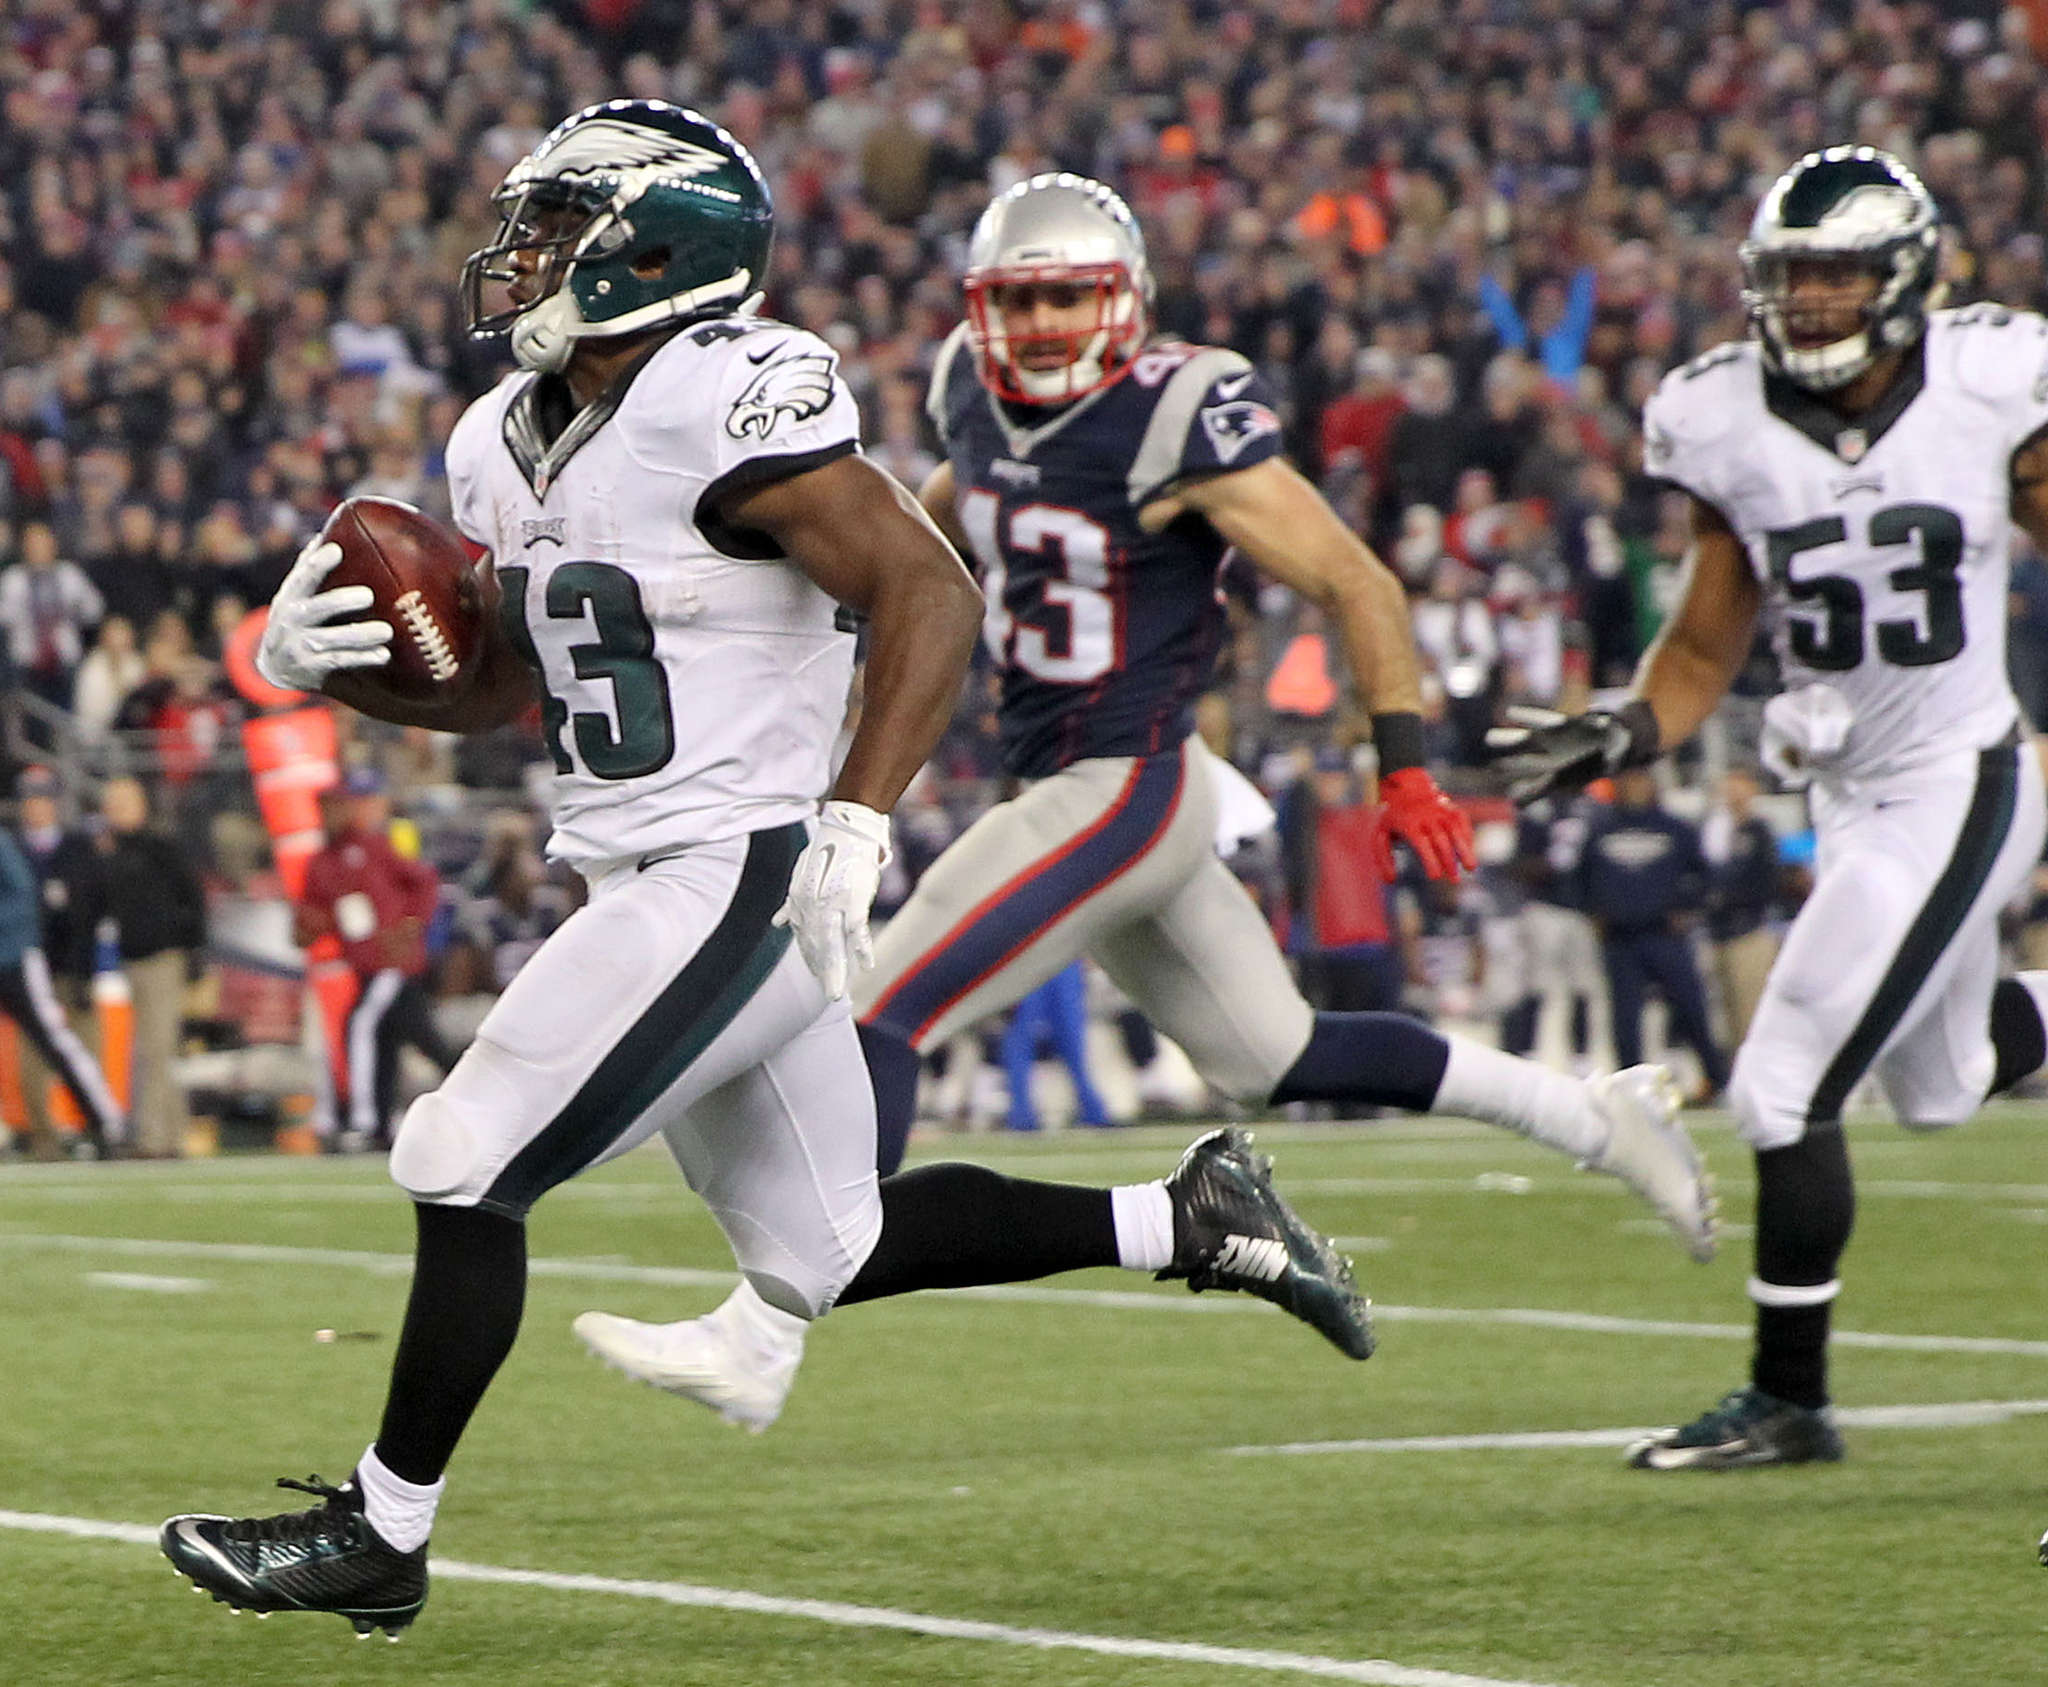 YONG KIM / STAFF PHOTOGRAPHER Darren Sproles returns punt 83 yards for touchdown in third quarter.